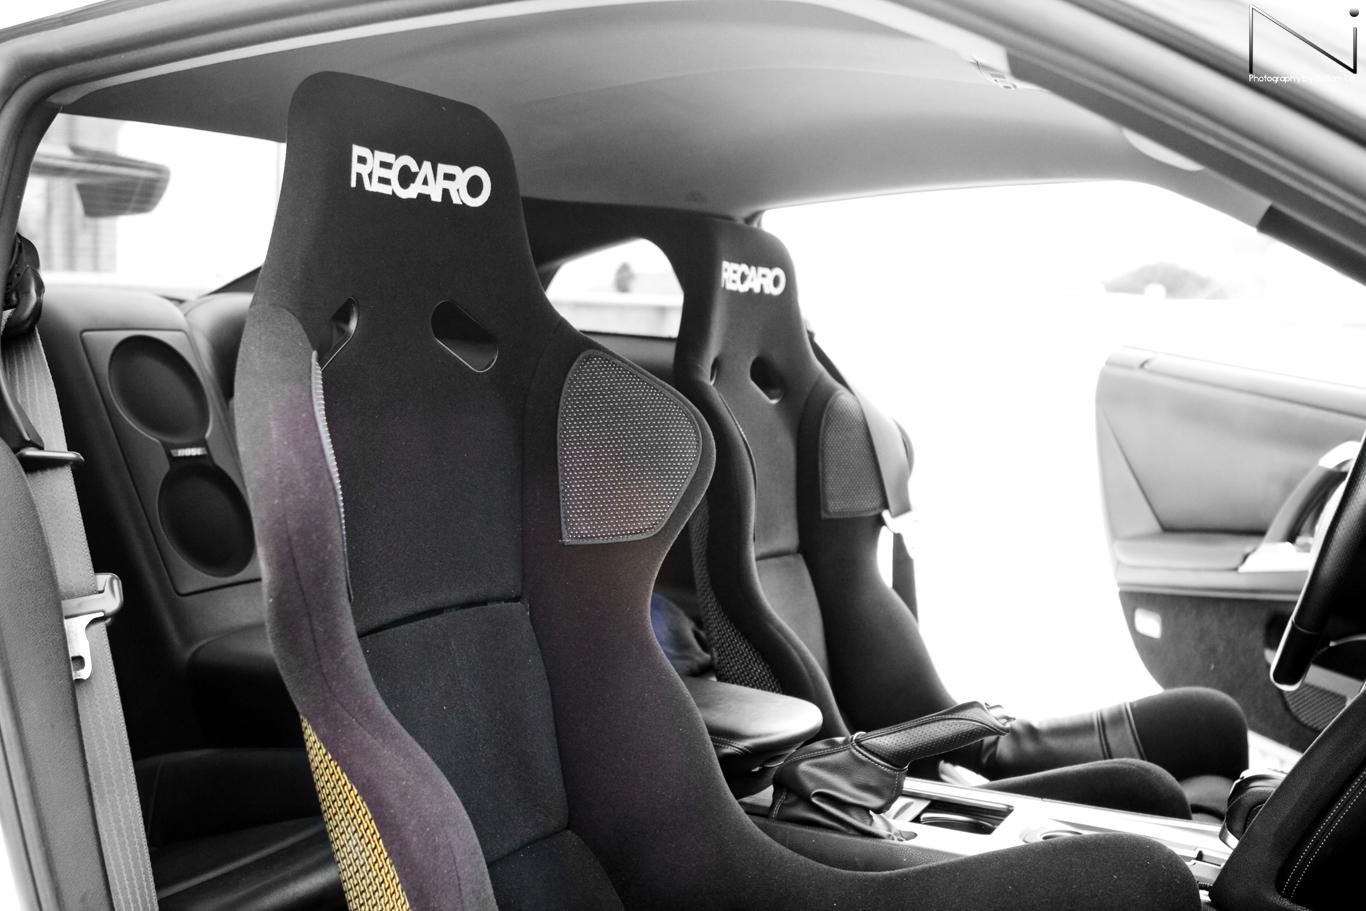 Recaro Profi Carbon-Kevlar SPA seats